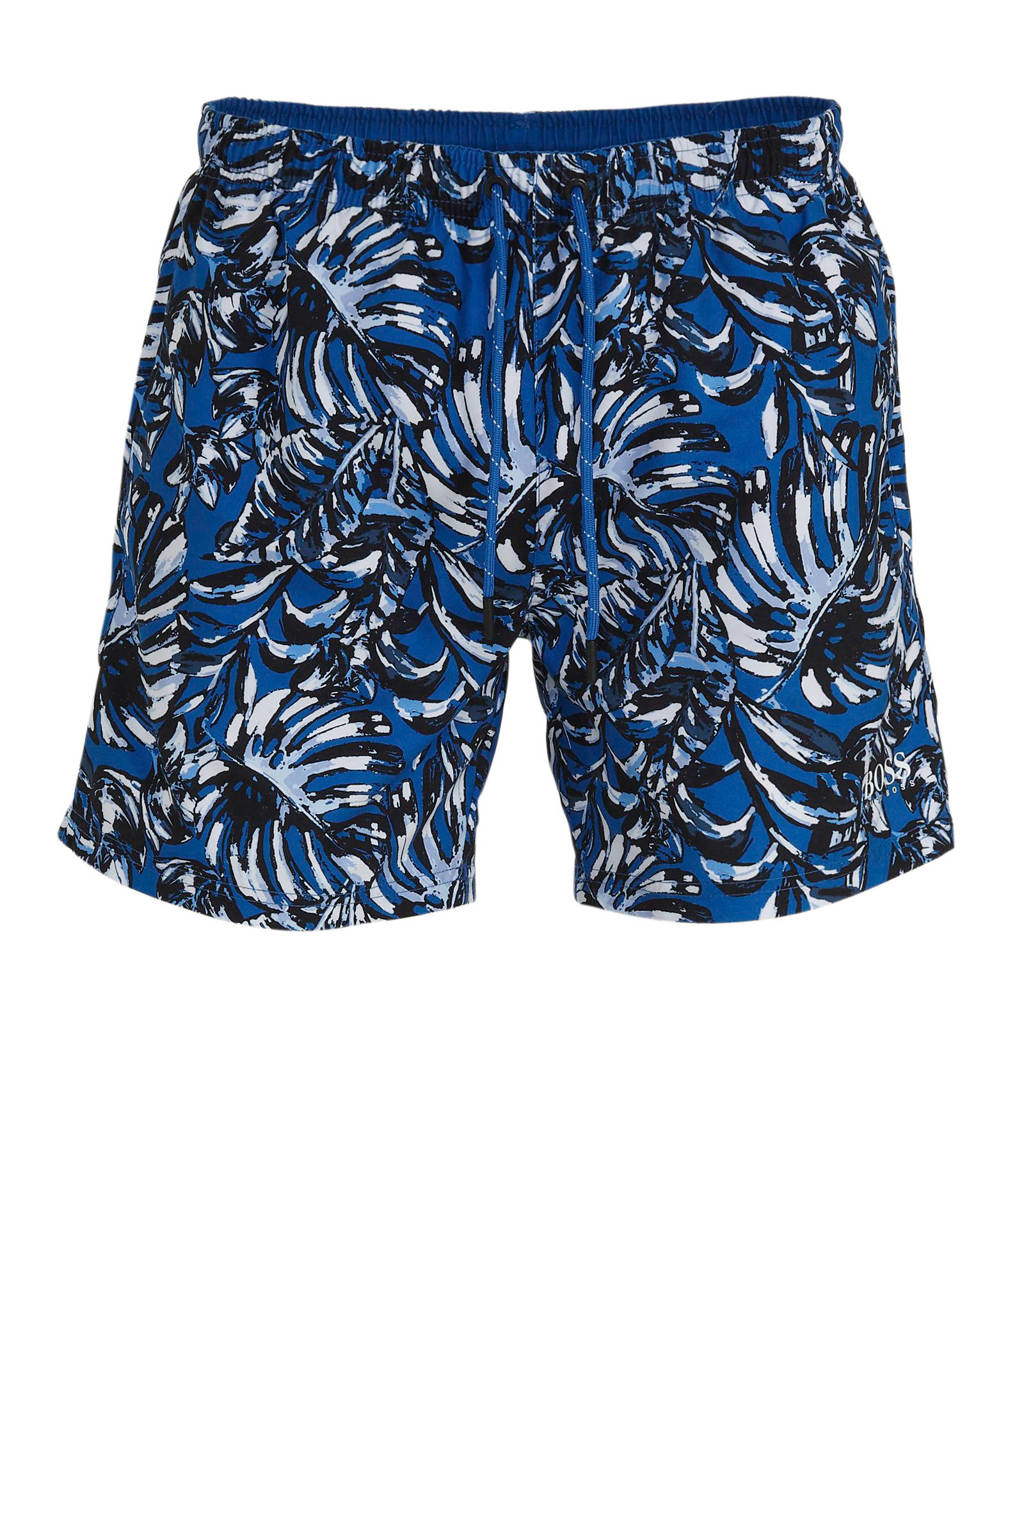 BOSS zwemshort met all over print blauw, Blauw